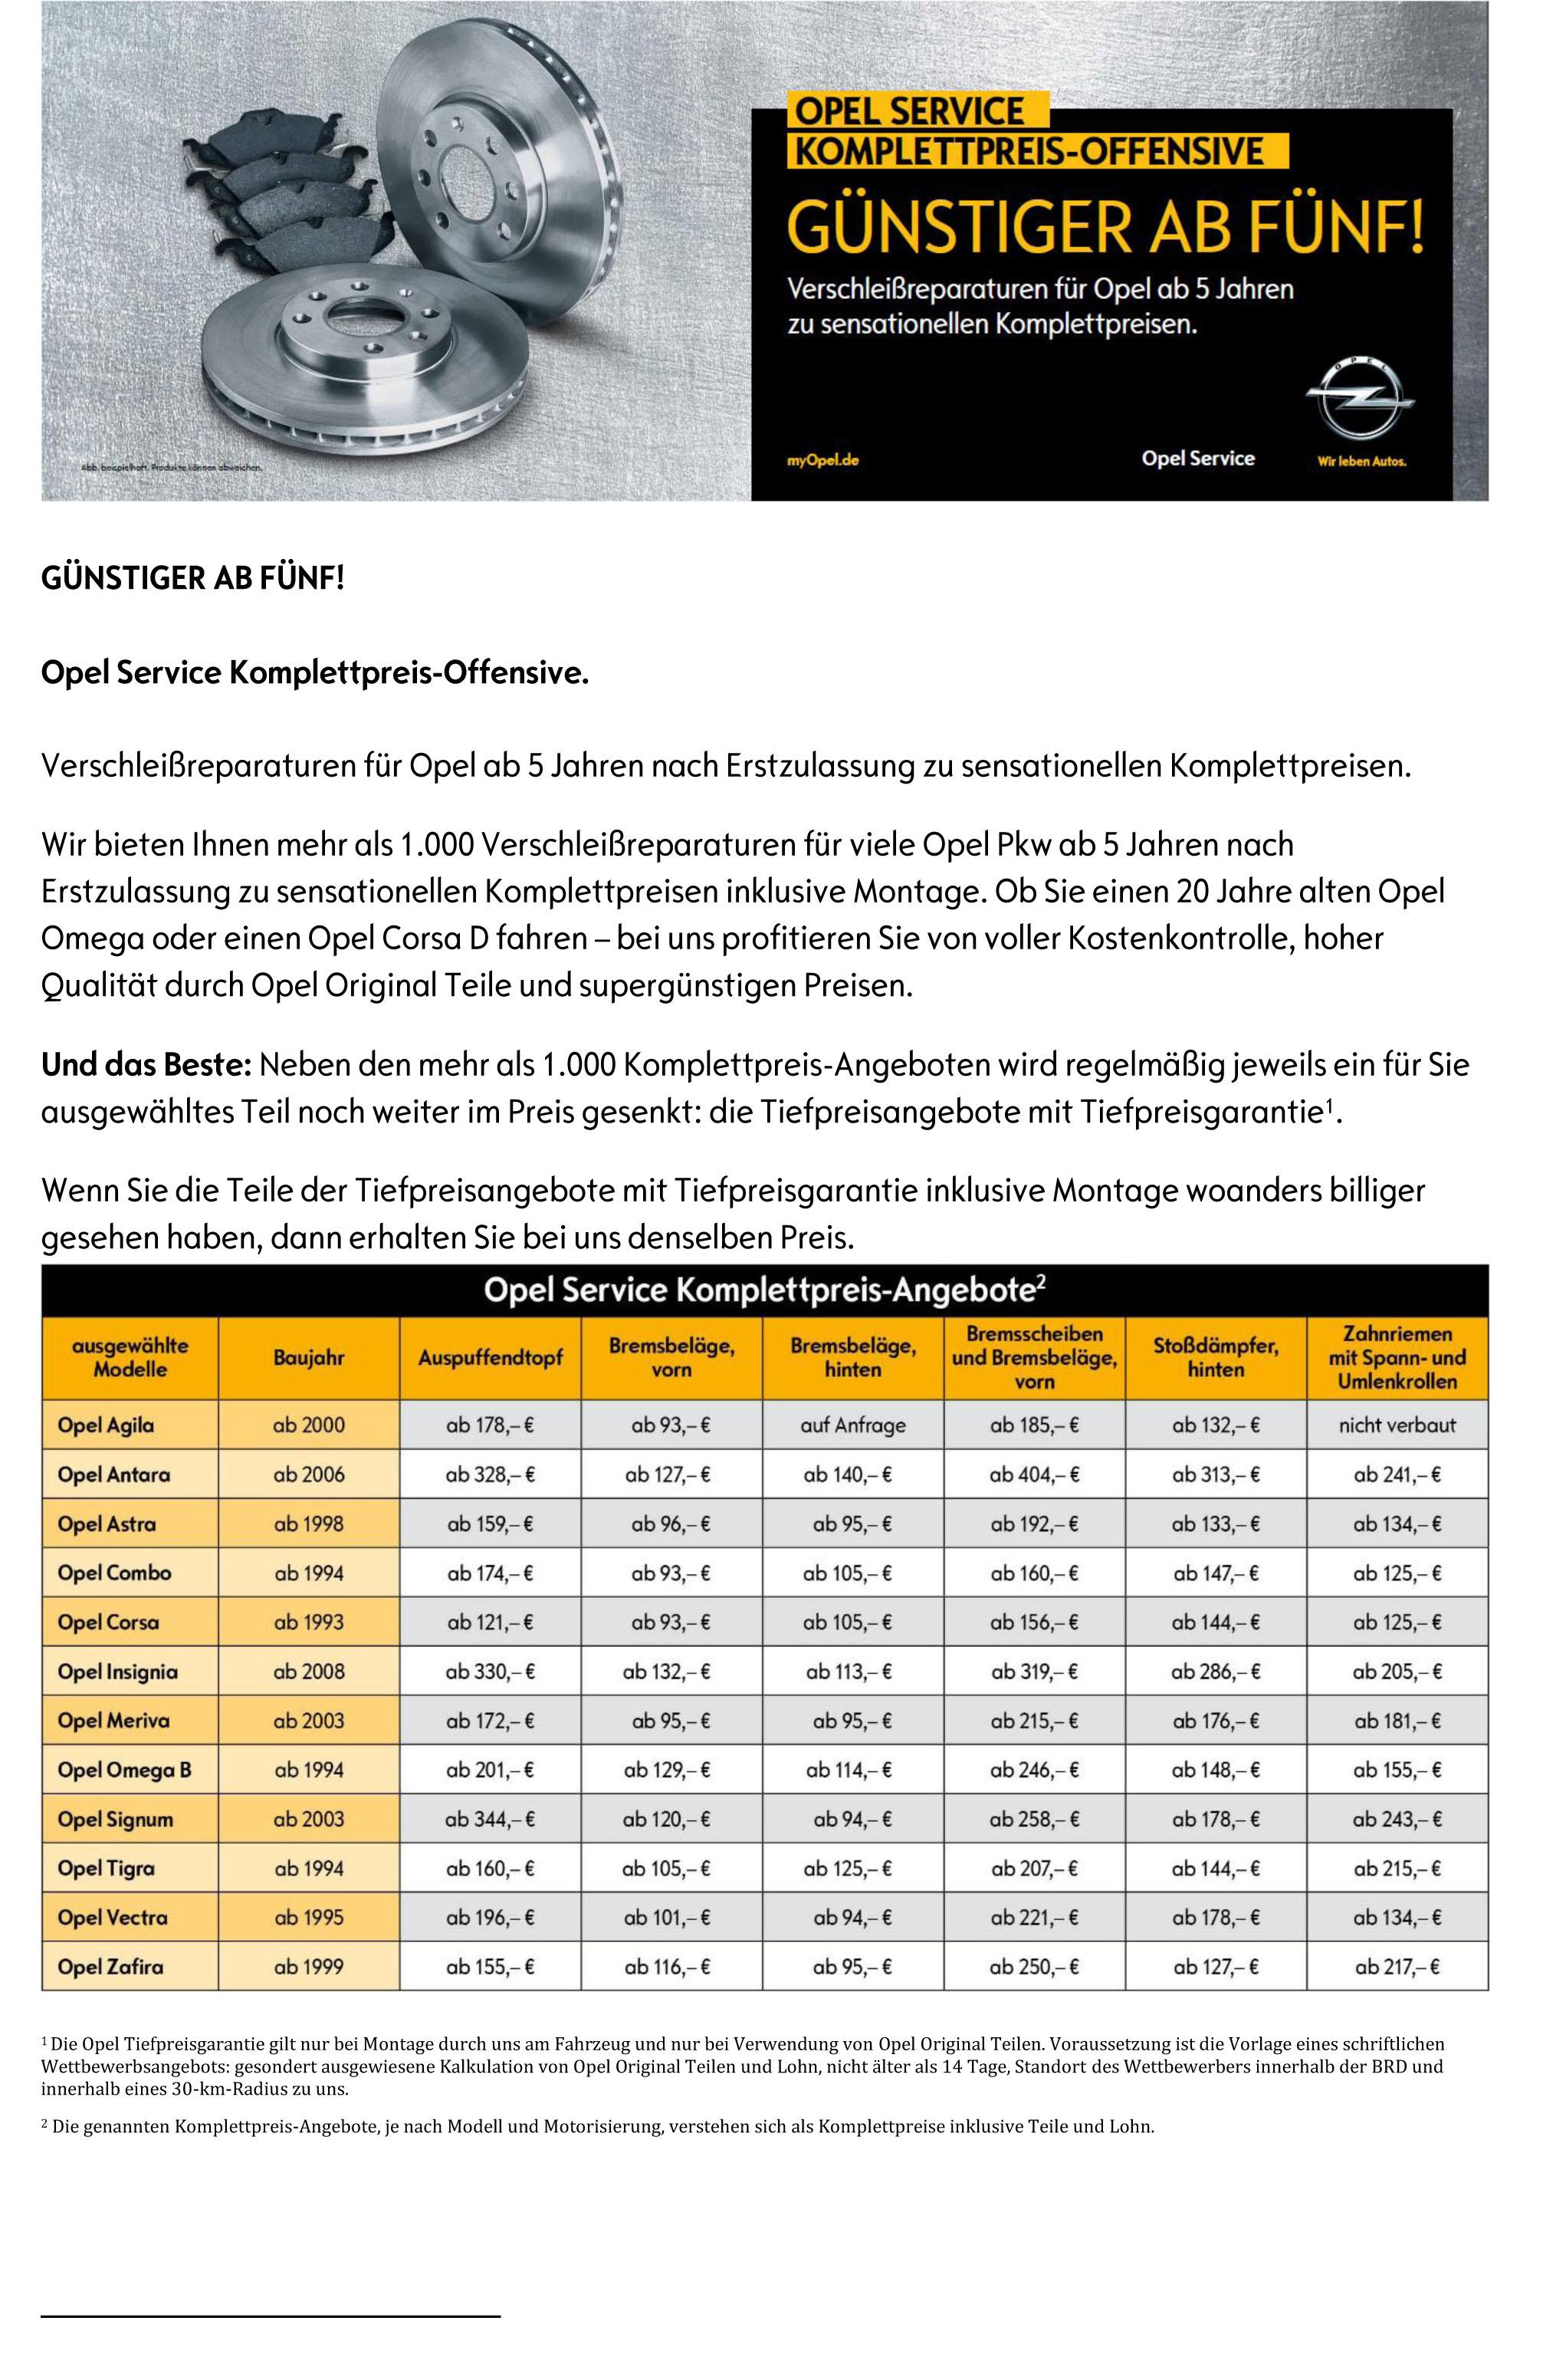 Autohaus stahl gmbh aus wenden opel service opel stahl for Autohaus stahl